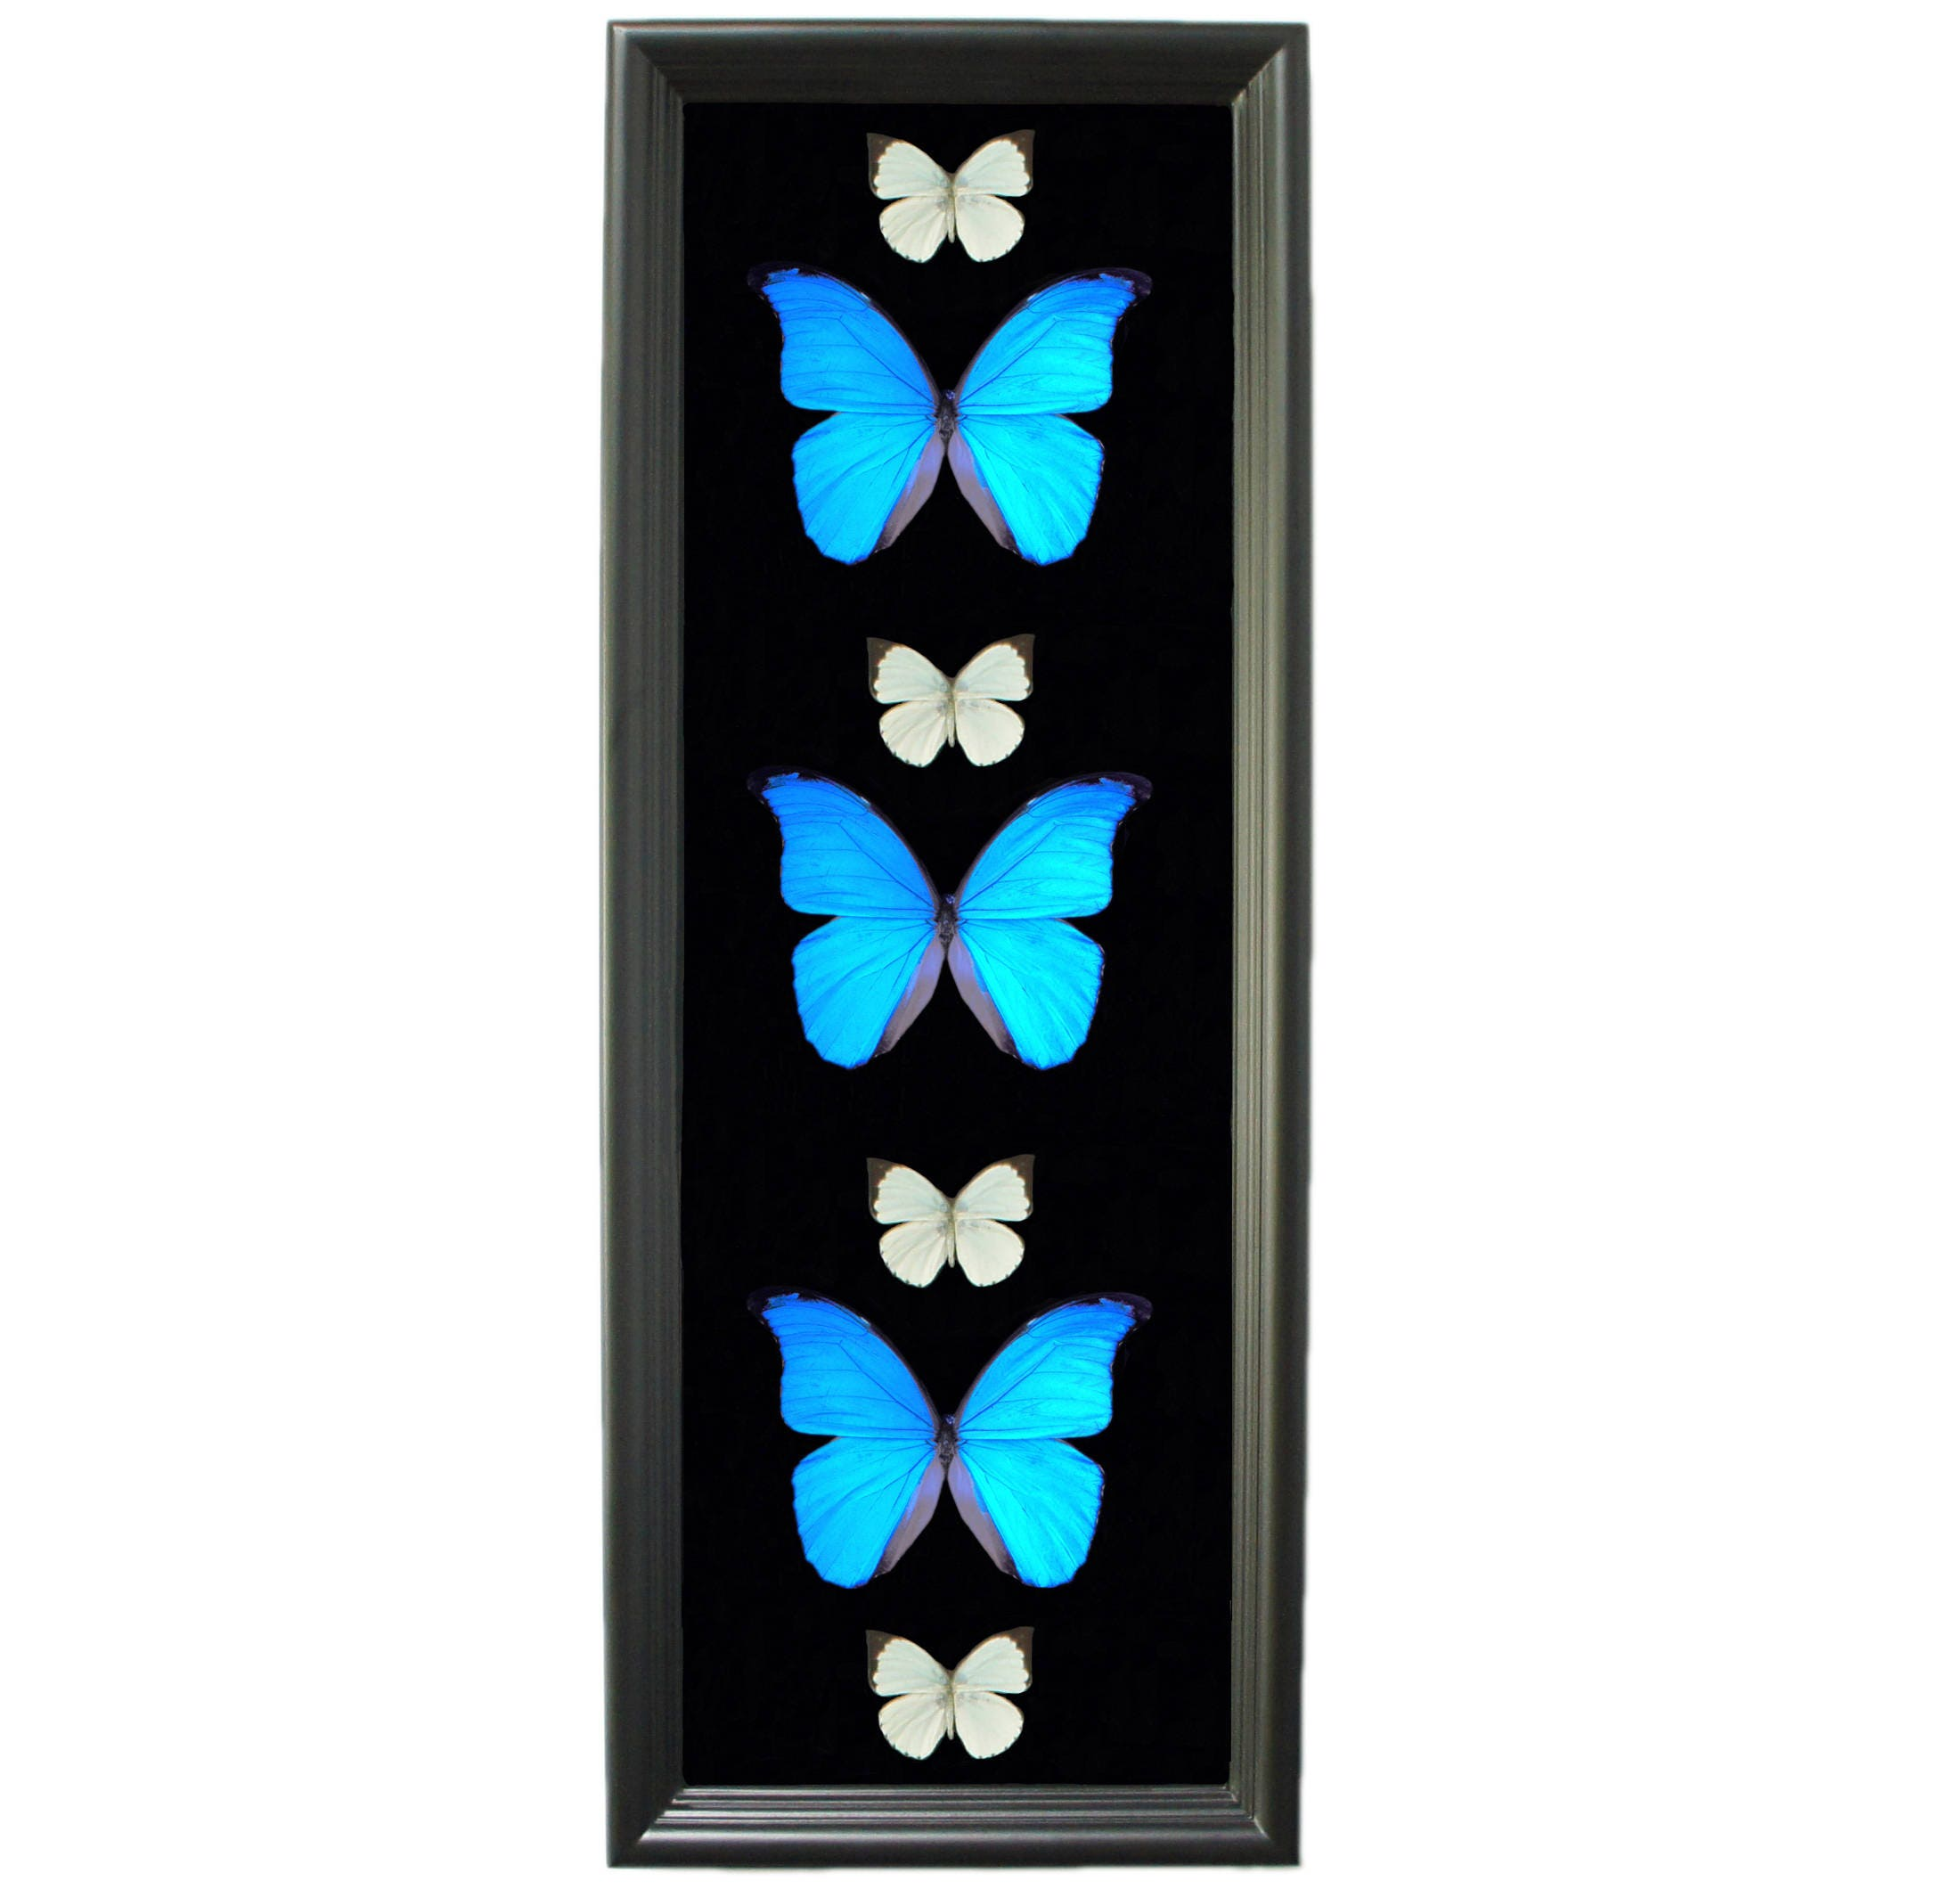 Real Butterfly Taxidermy Butterfly Framed Art Butterfly